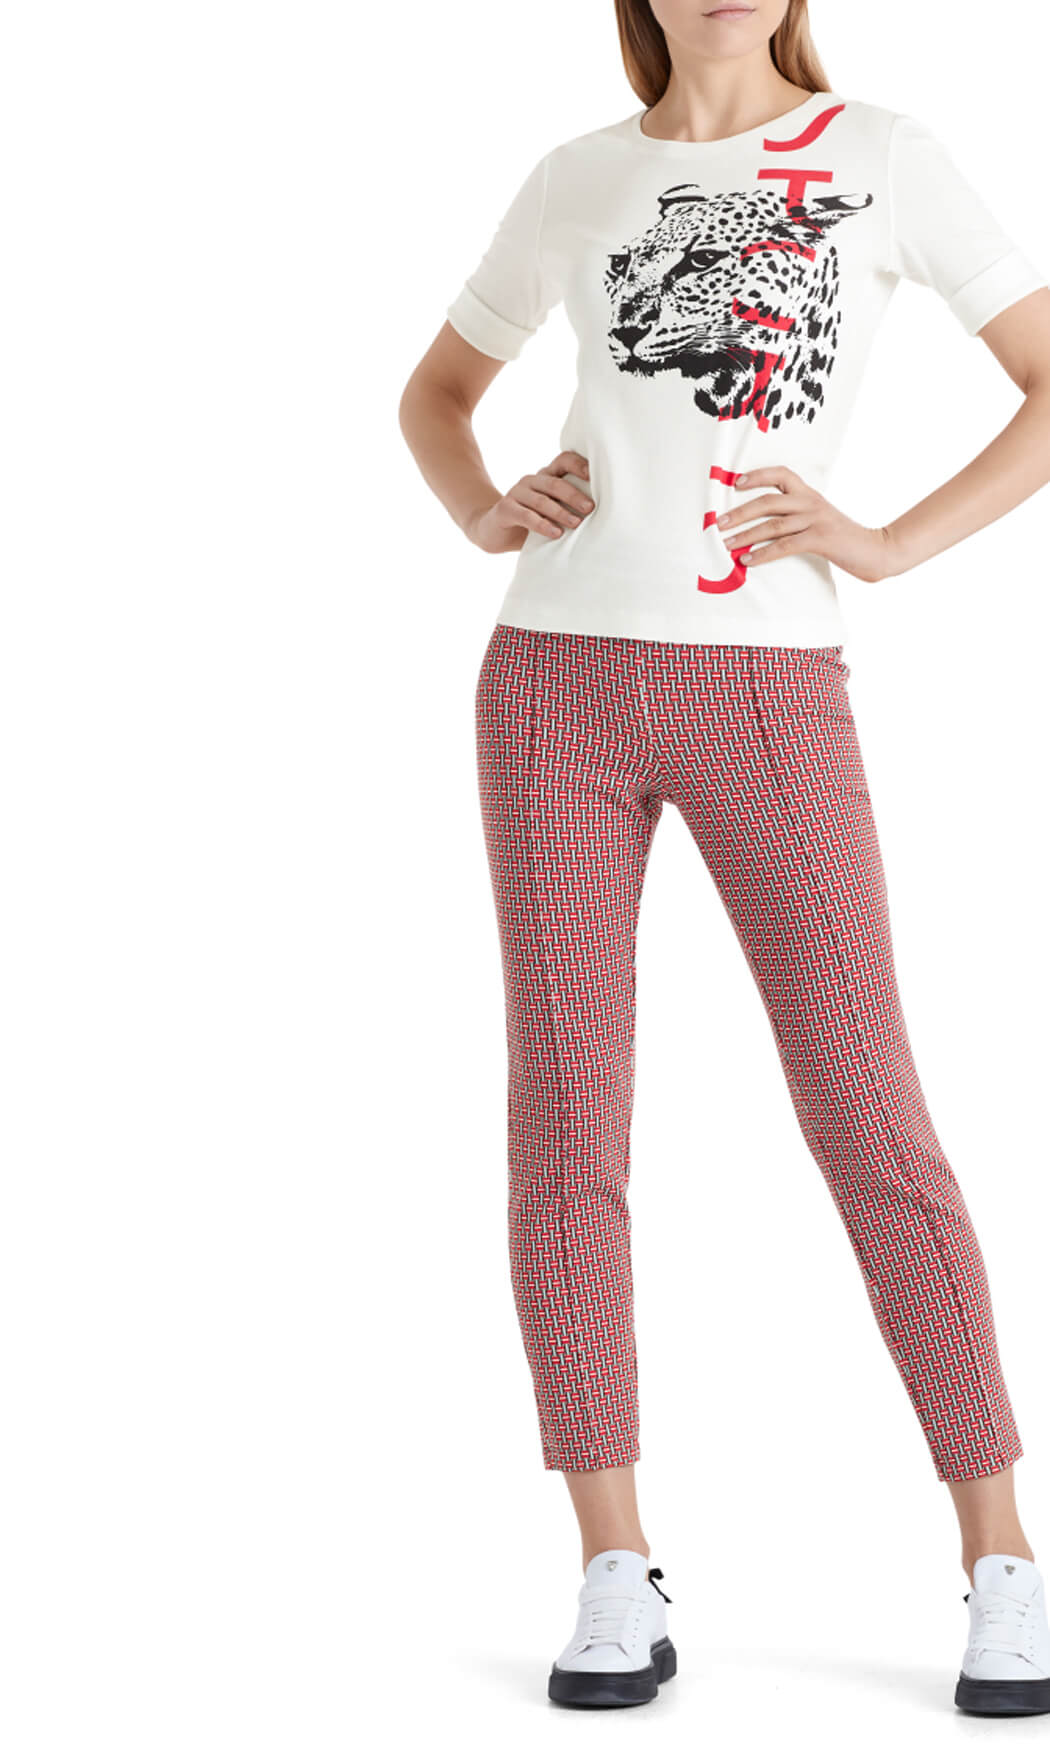 Marccain Sports Dames Shirt met luipaardkop wit